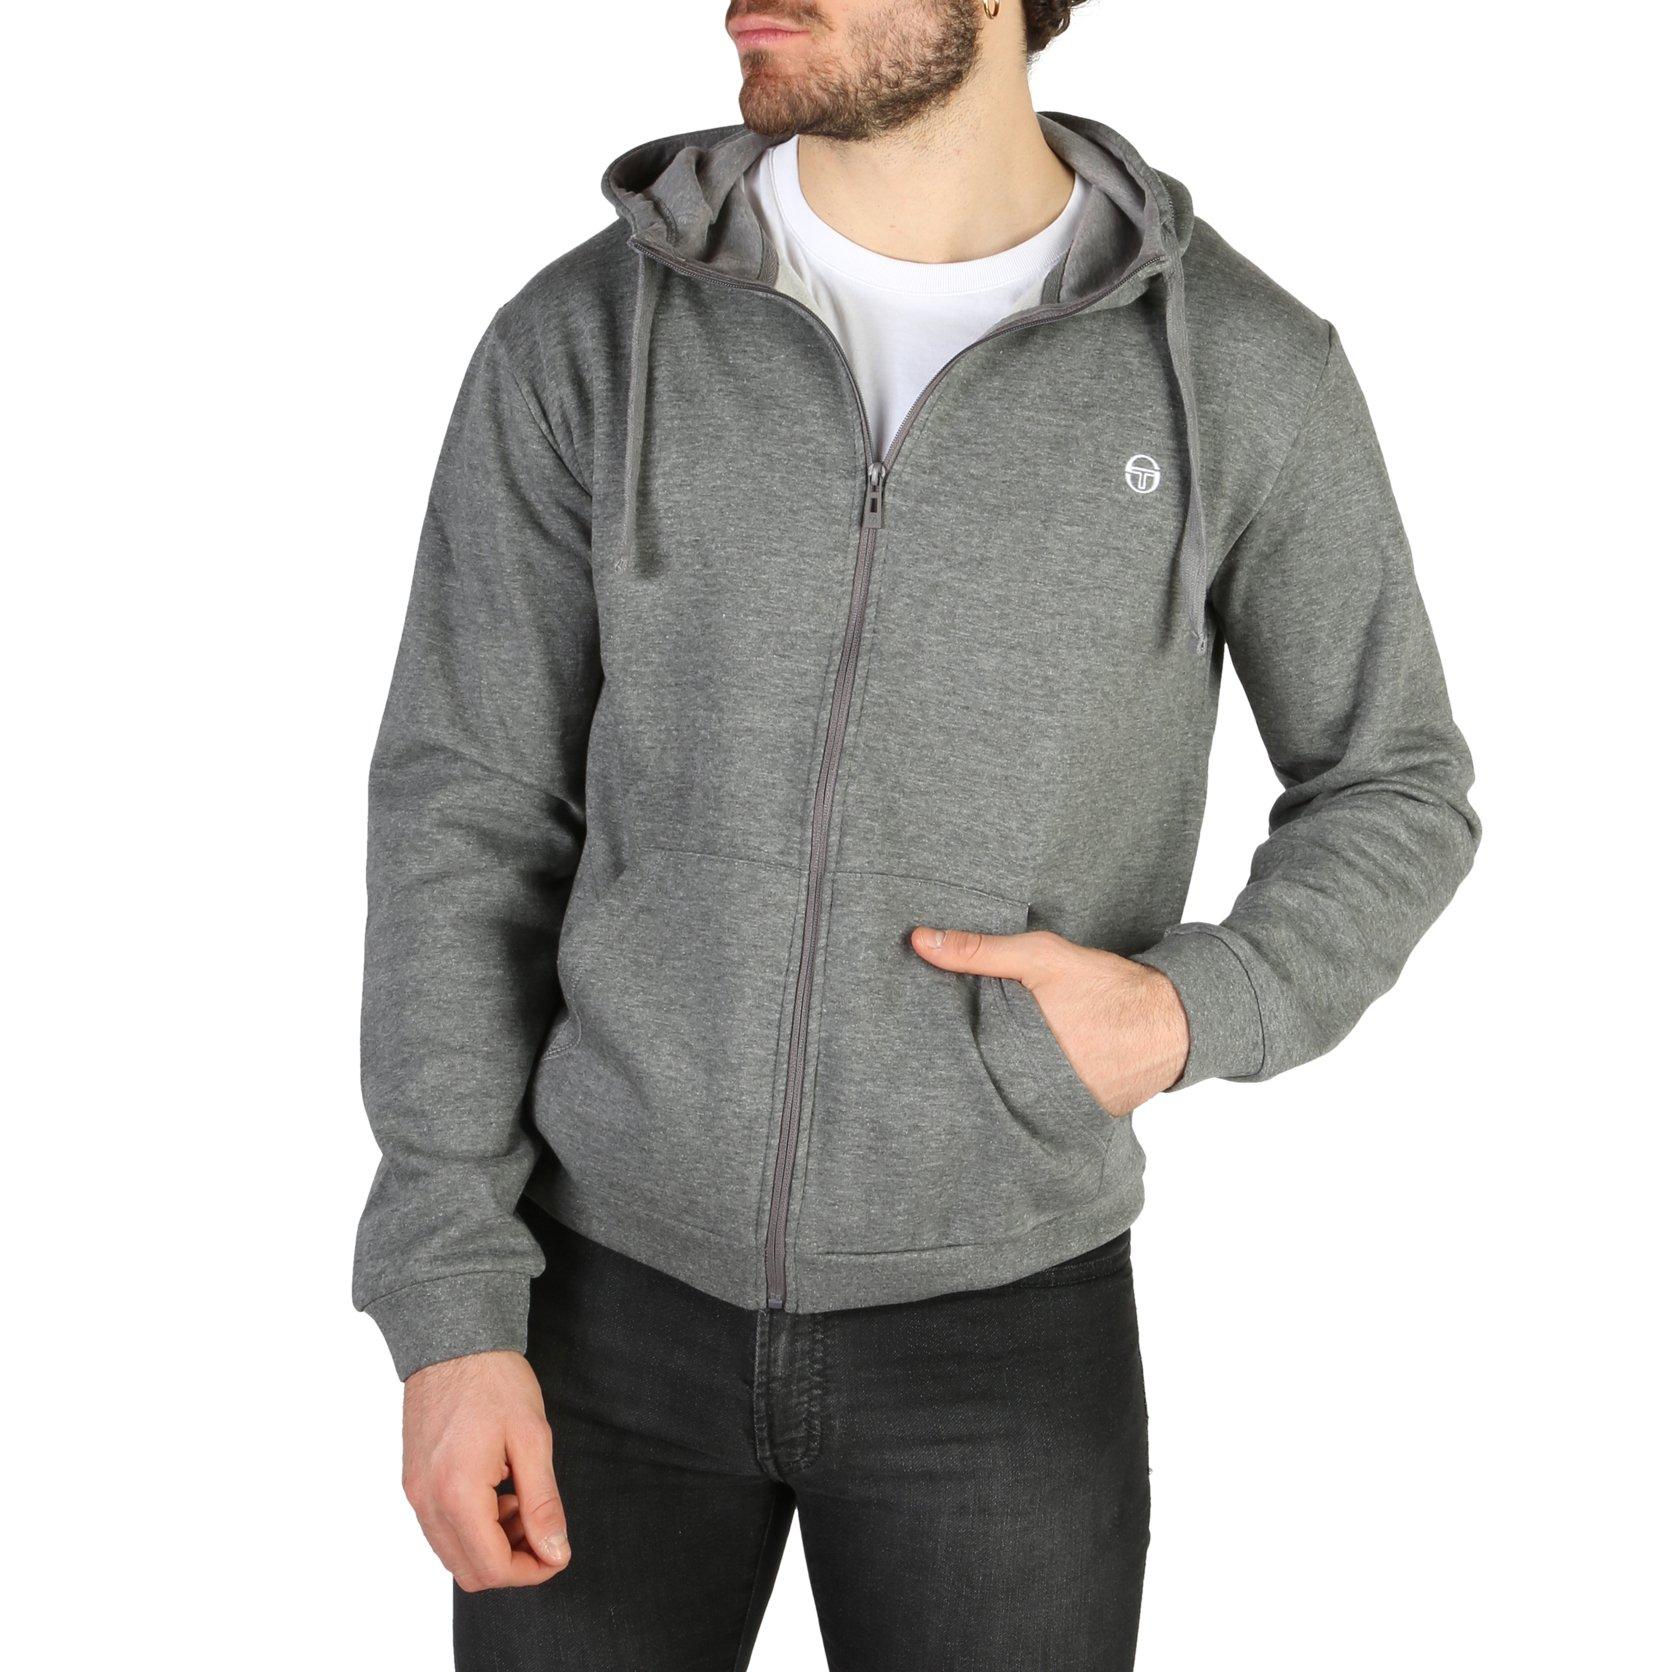 Sergio Tacchini Men's Sweatshirt Various Colours 103-10001 - grey S